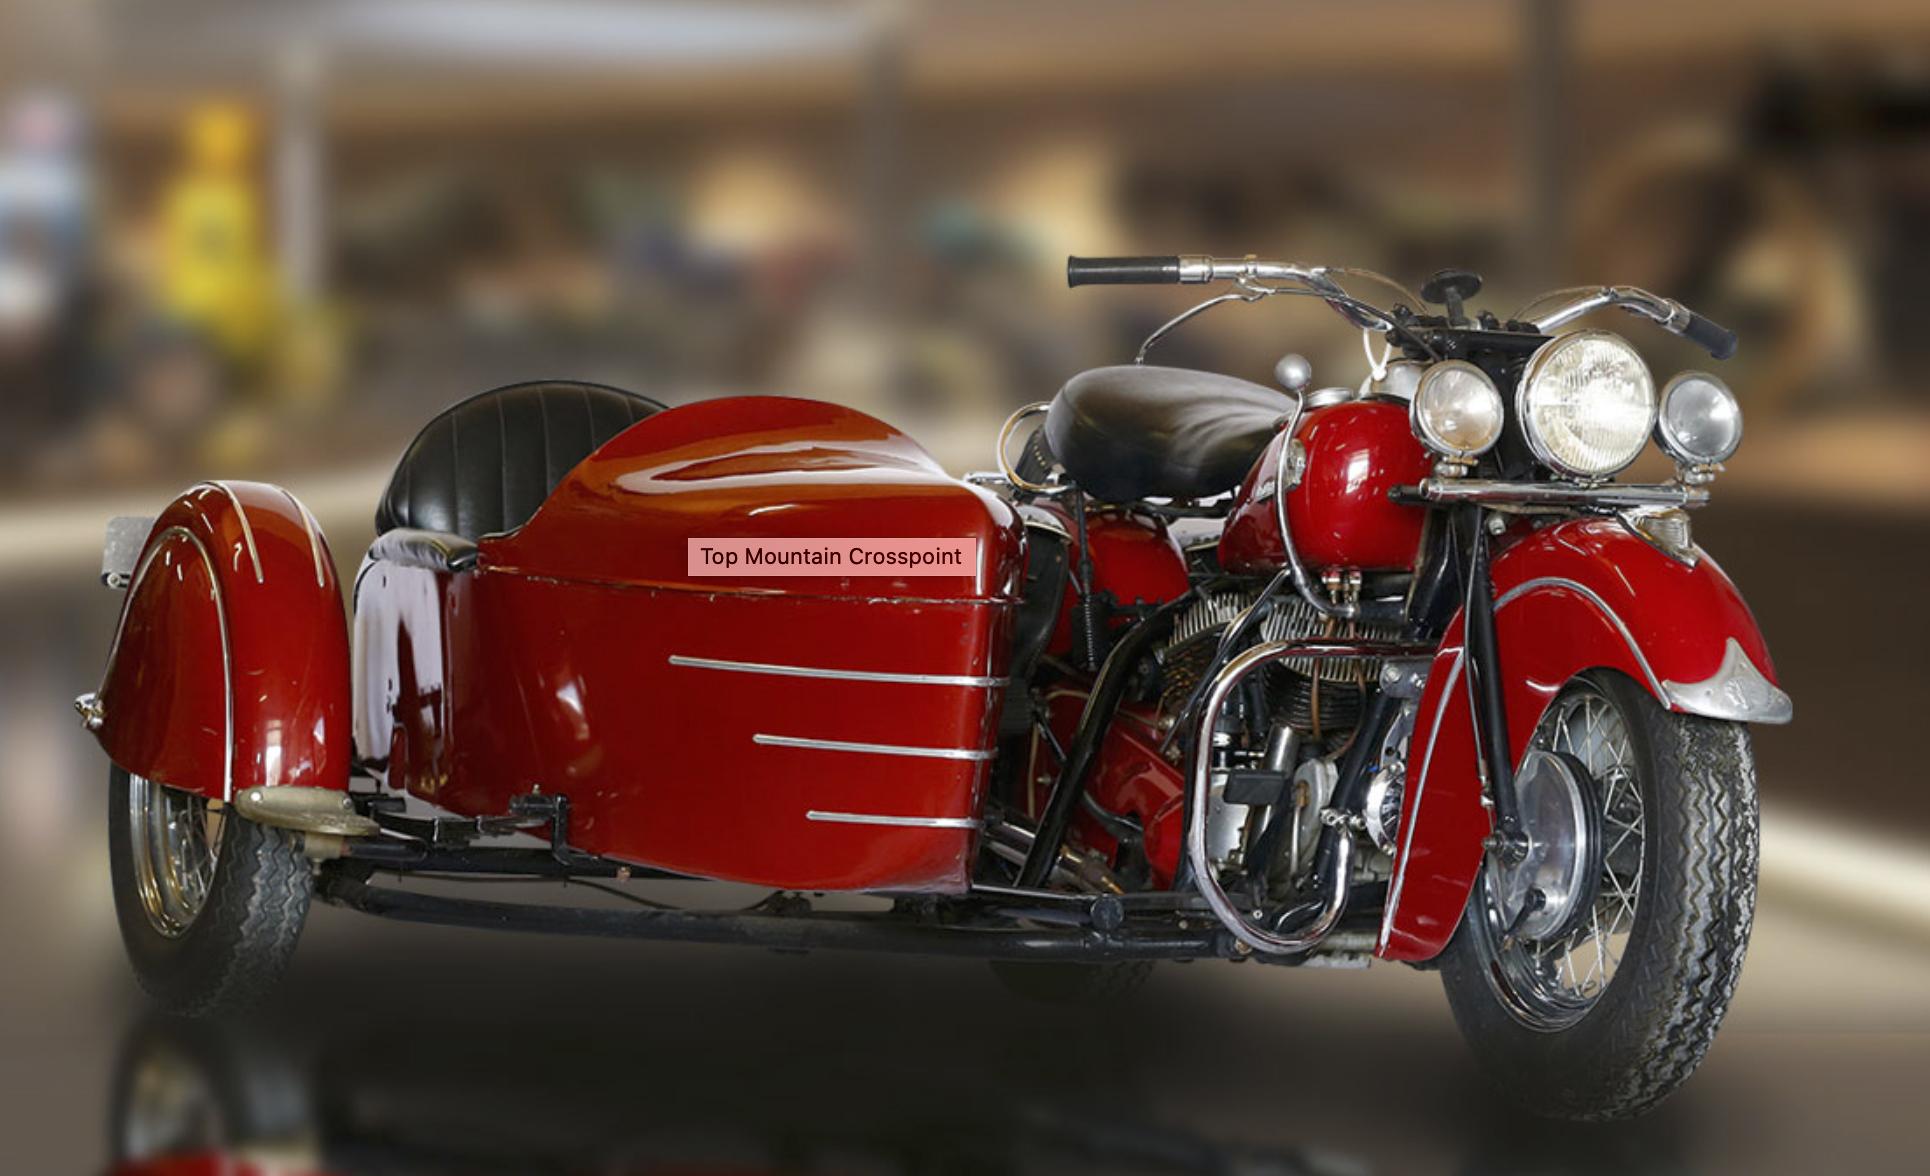 Top Mountain Motorcycle Museum vintage motorcycle 2